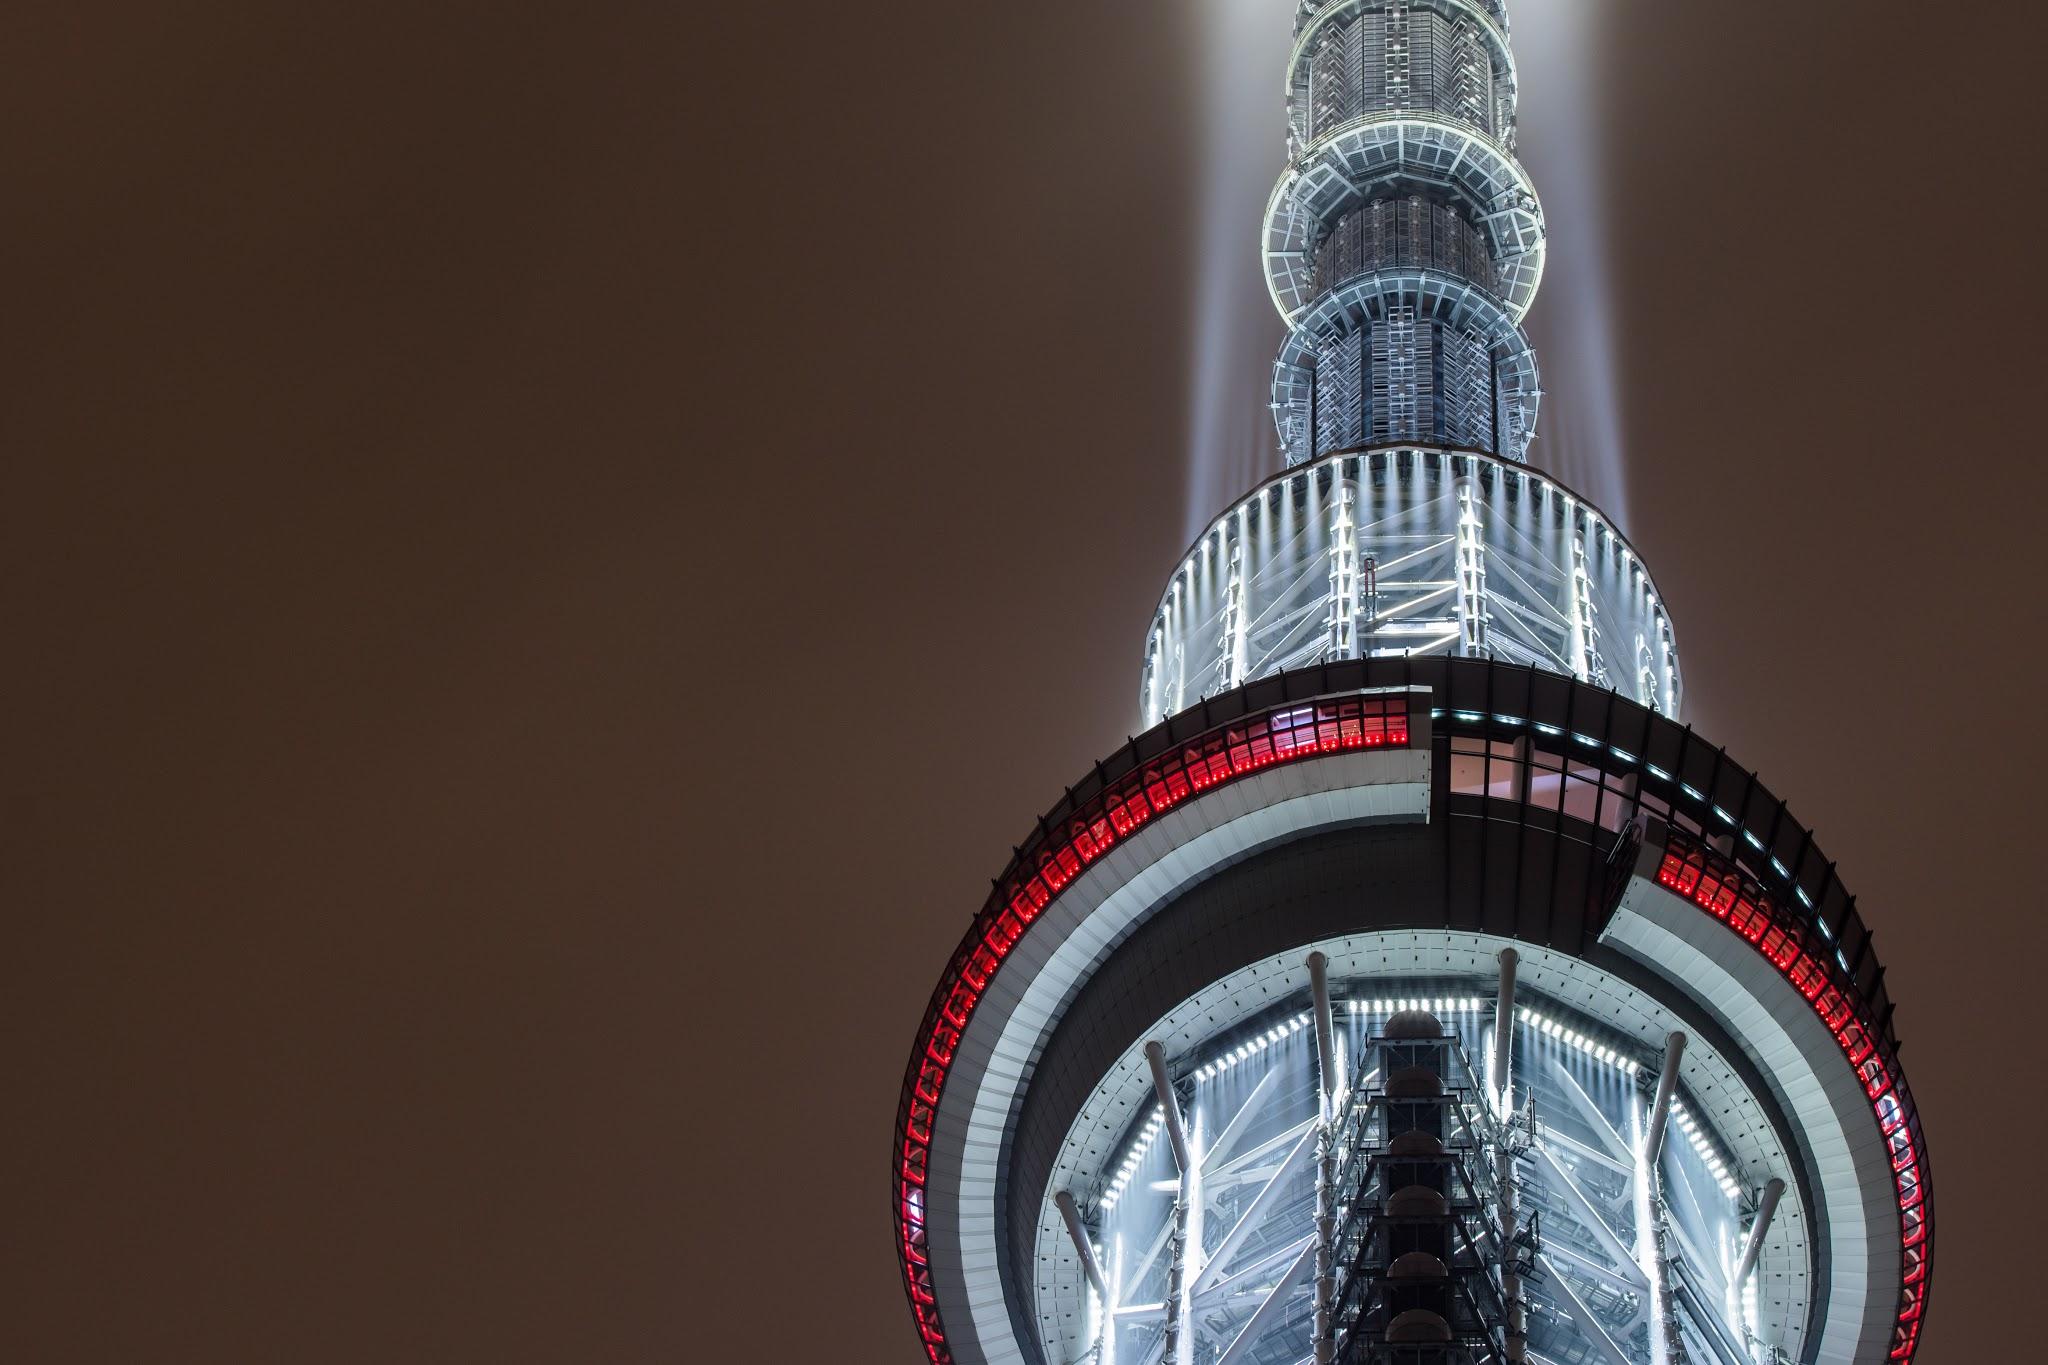 Photo: 「宇宙への放出」 / Ray of civilization.  天へと伸びる 文明の大樹 存在を示すかのように 宇宙へと今日も光を放つ  TOKYO SKYTREE (東京スカイツリー)  #nikon #sigma #nightview #landscape #tokyo  Nikon D500 SIGMA 150-600mm F5-6.3 DG OS HSM Contemporary